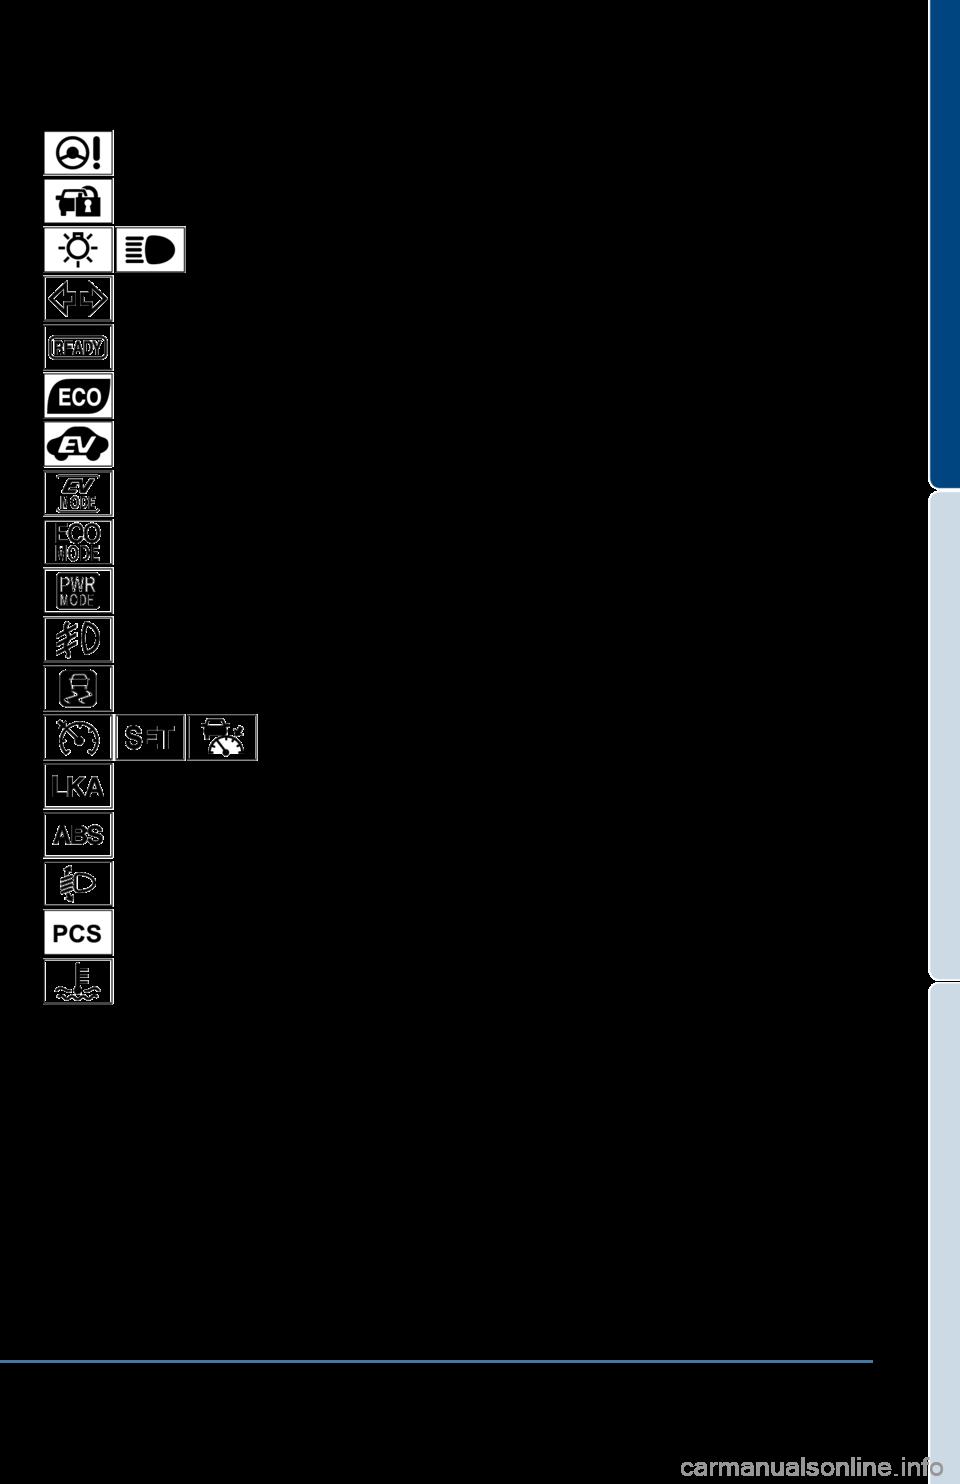 Sienna toyota sienna dashboard warning symbols toyota sienna toyota prius 2014 3g quick reference guide 2005 toyota corolla dashboard warning lights buycottarizona